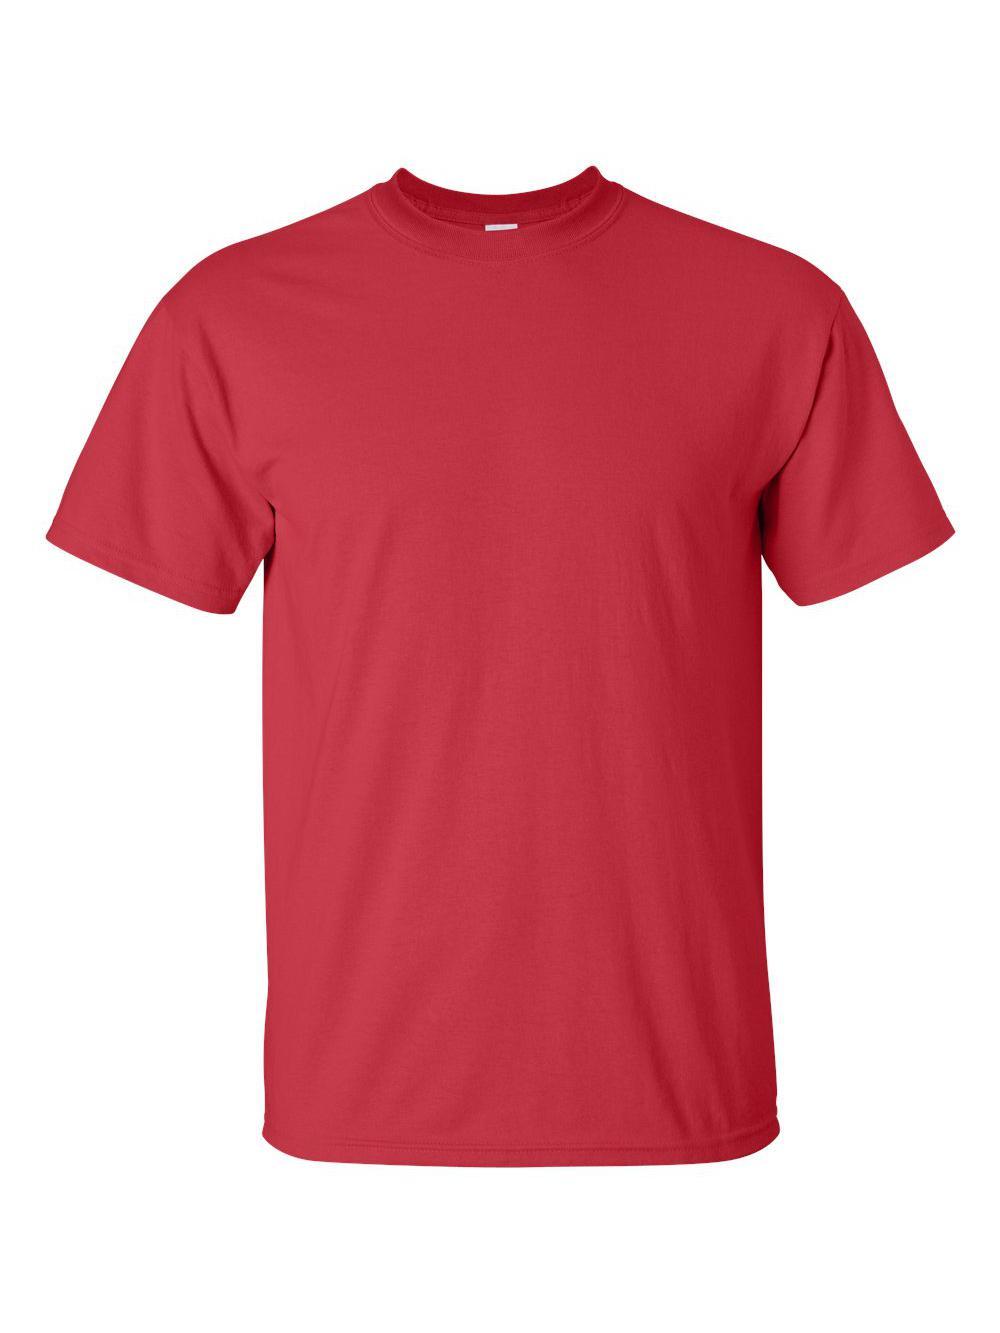 Gildan-Ultra-Cotton-T-Shirt-Tall-Sizes-2000T thumbnail 12